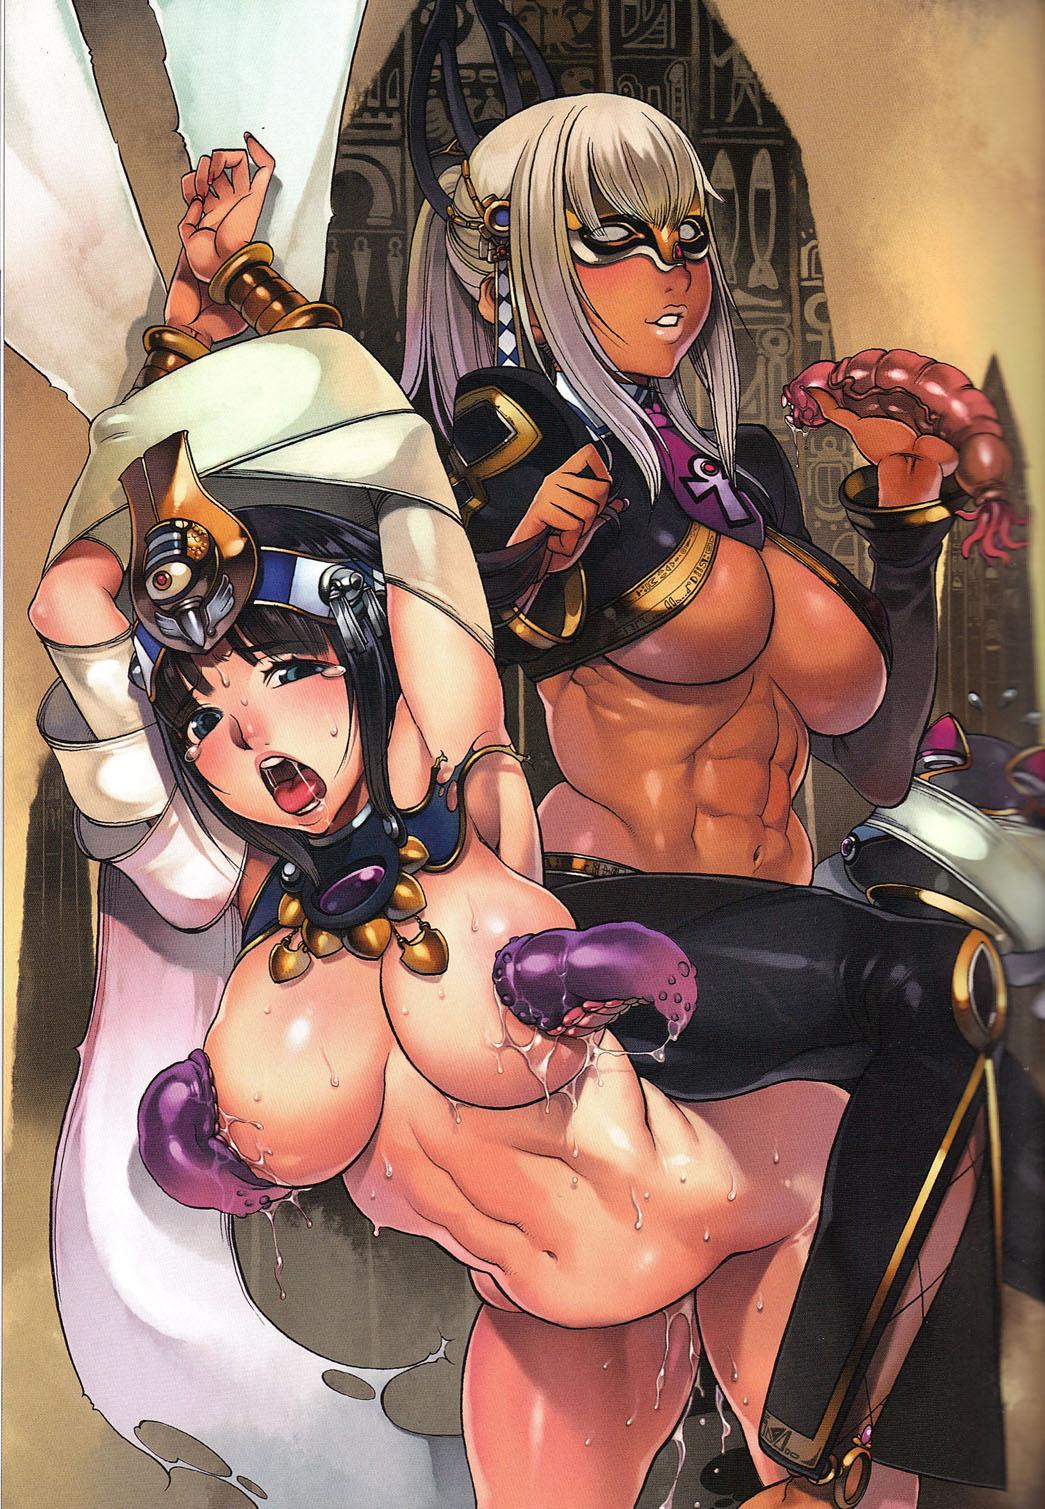 Xxx queen blade xxx nudes comics